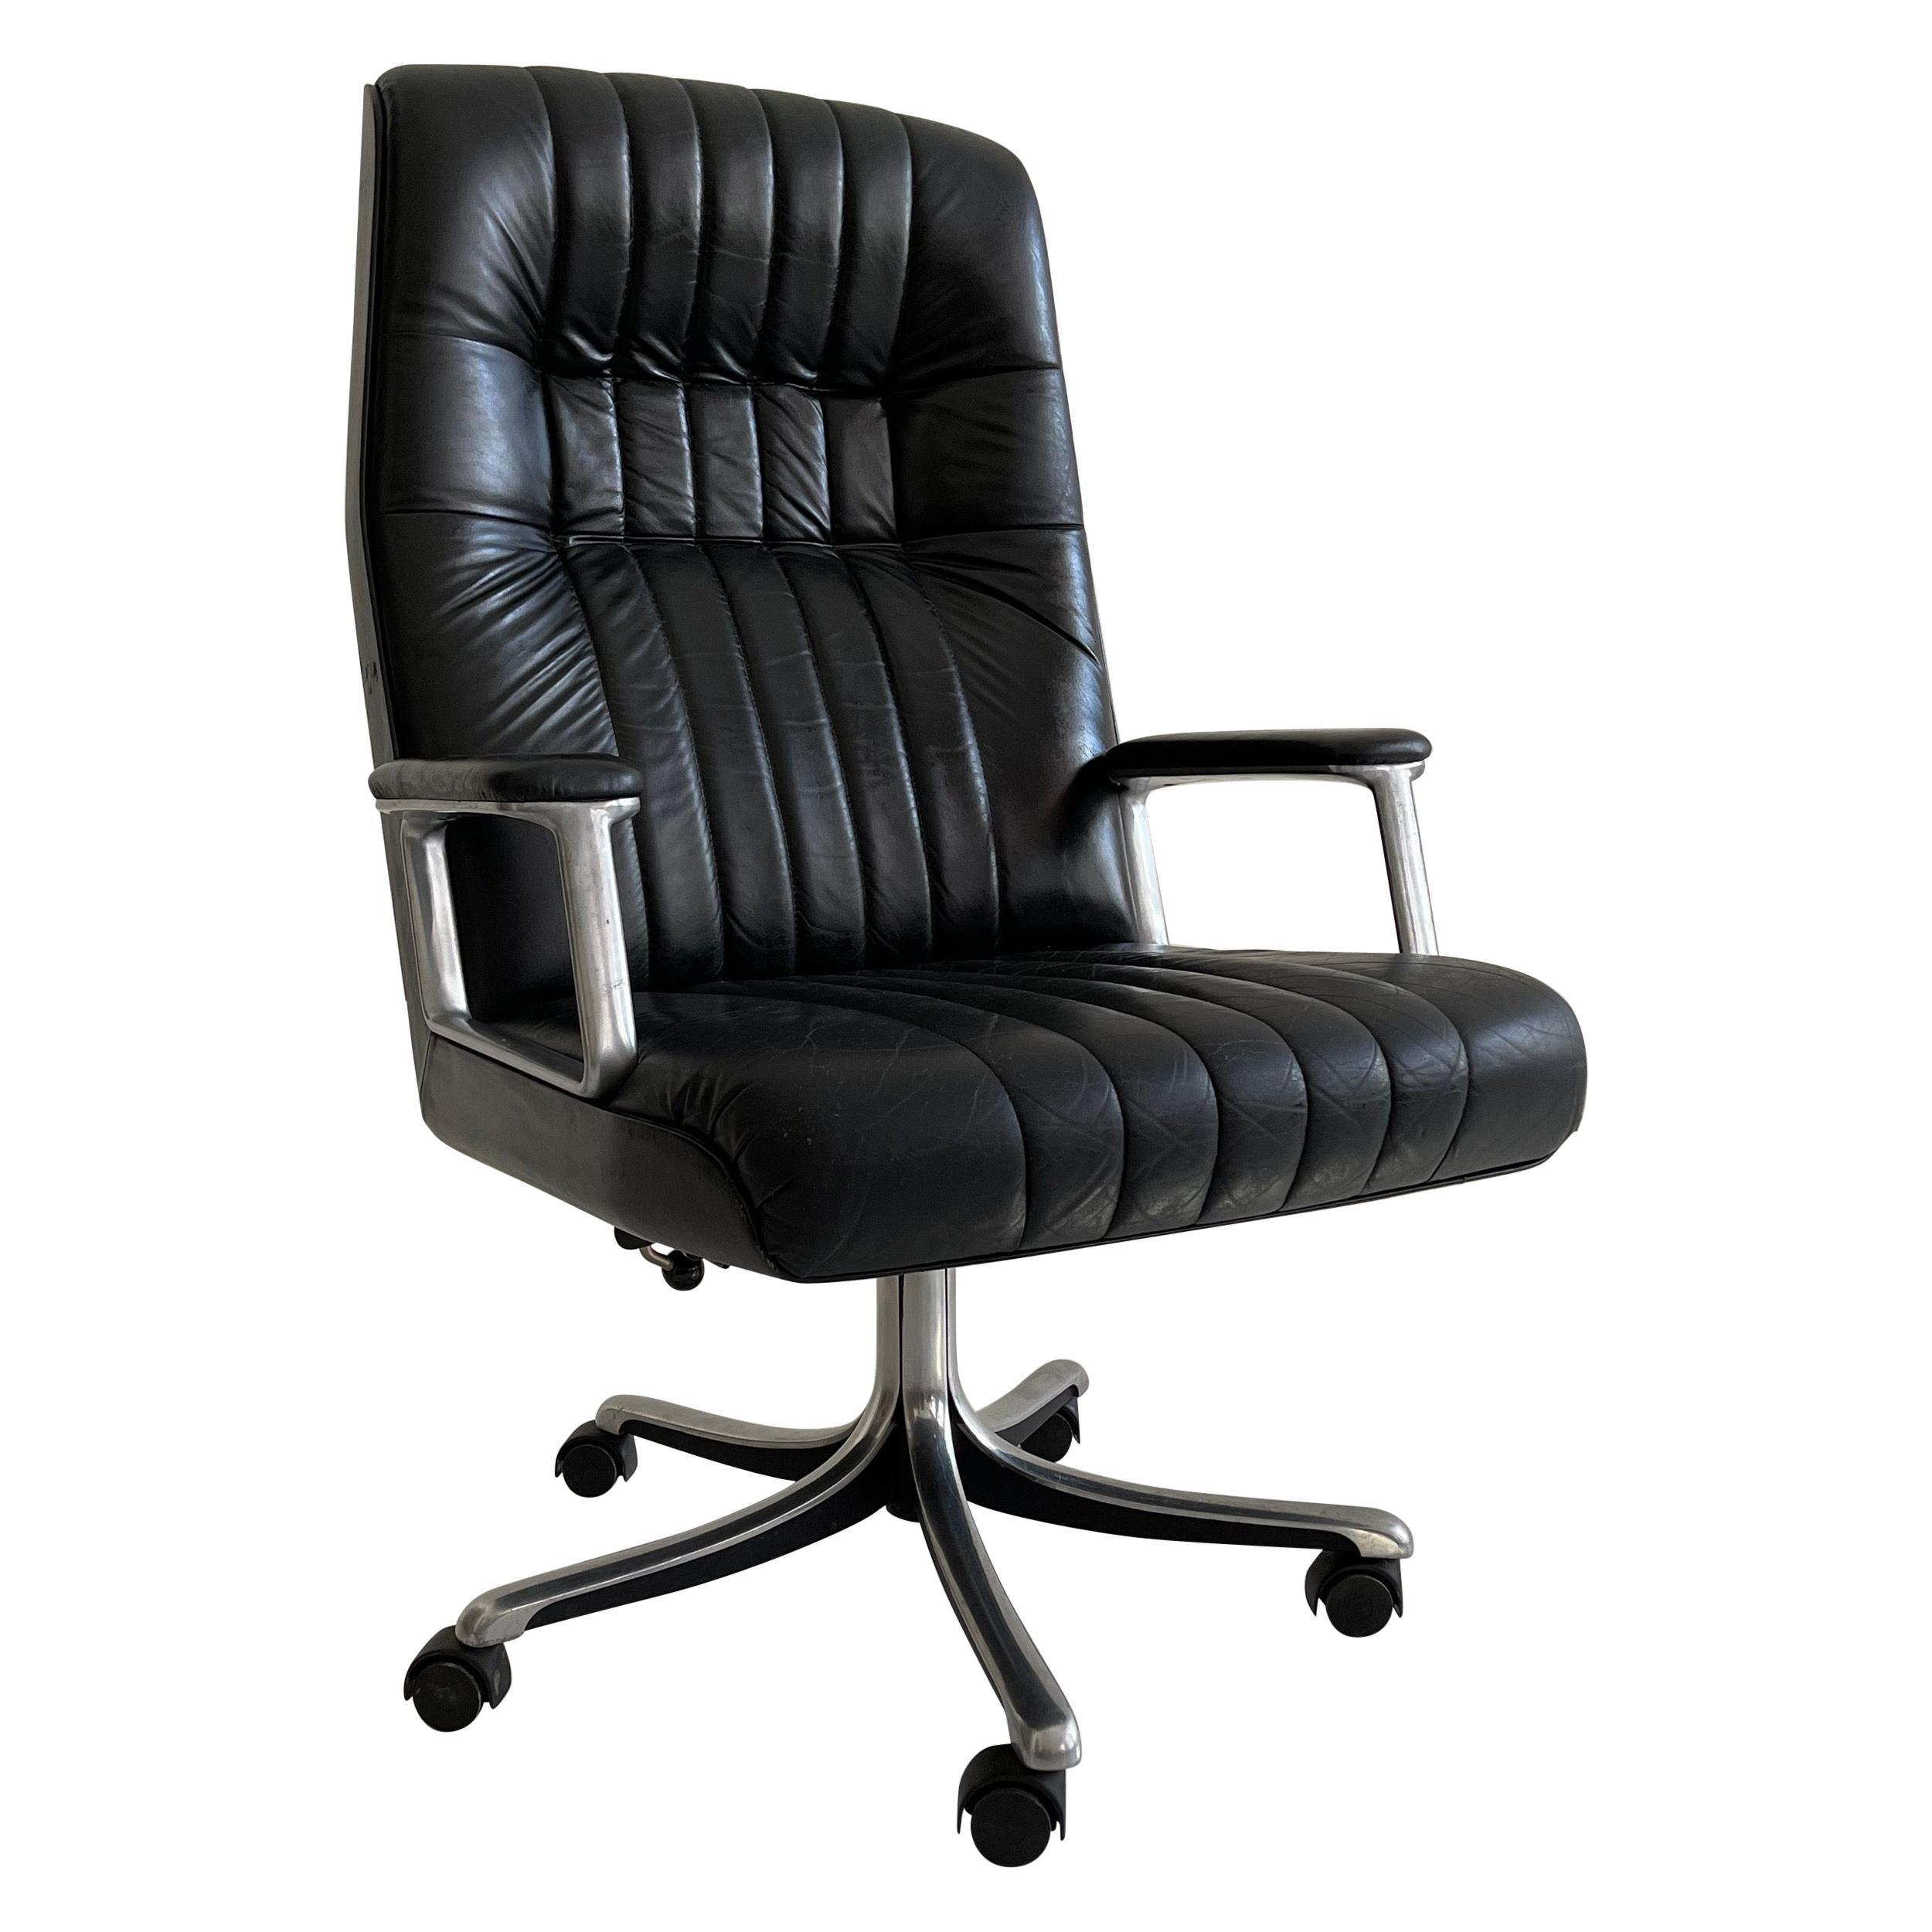 Desk Chair by Osvaldo Borsani for Tecno, Italy, 1960s